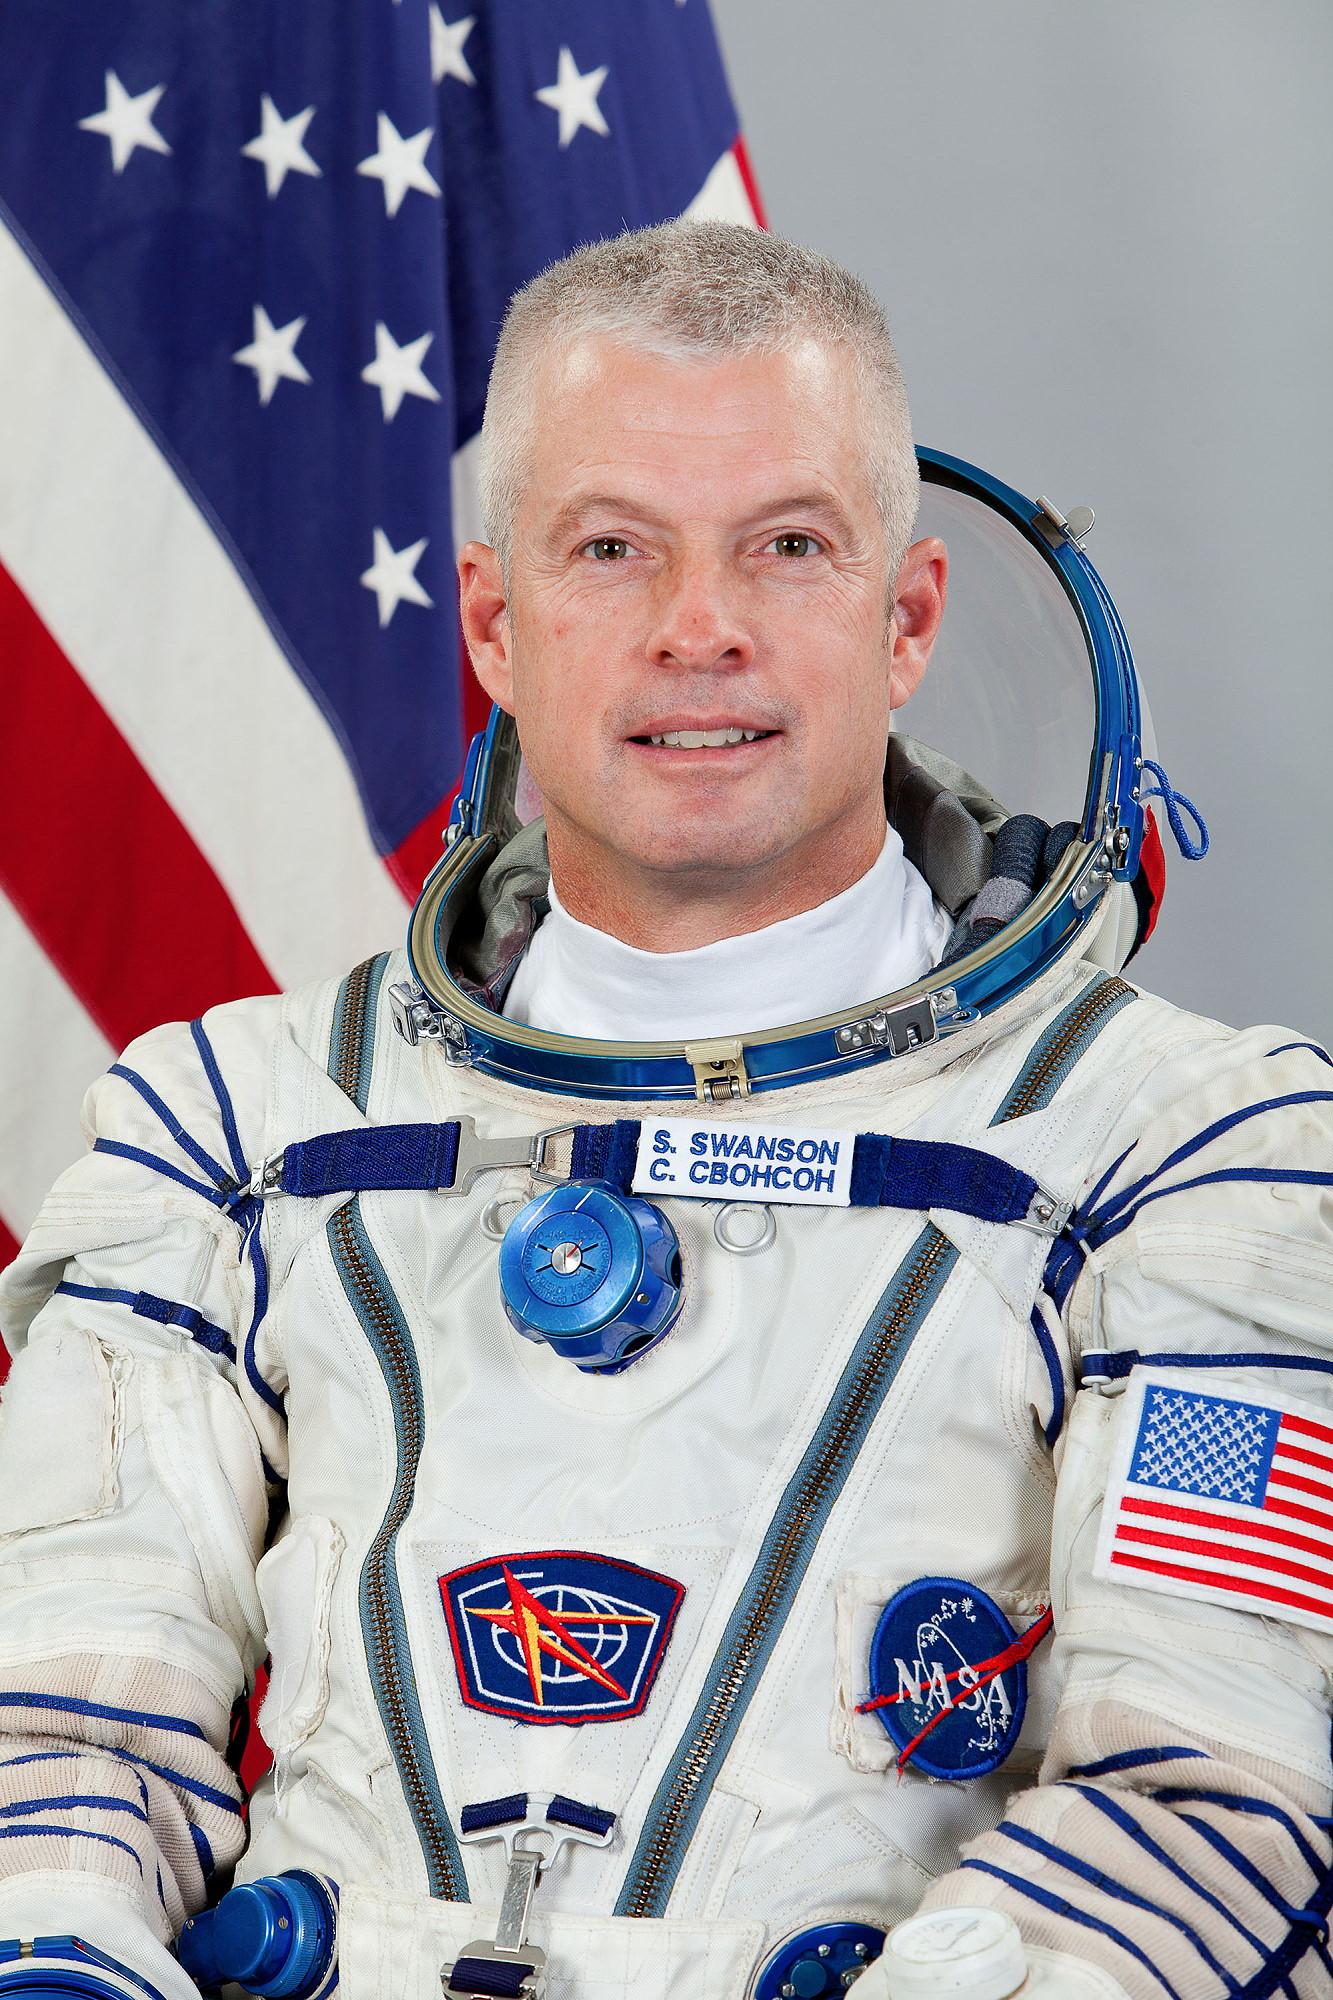 Astronaut Biography Steven Swanson